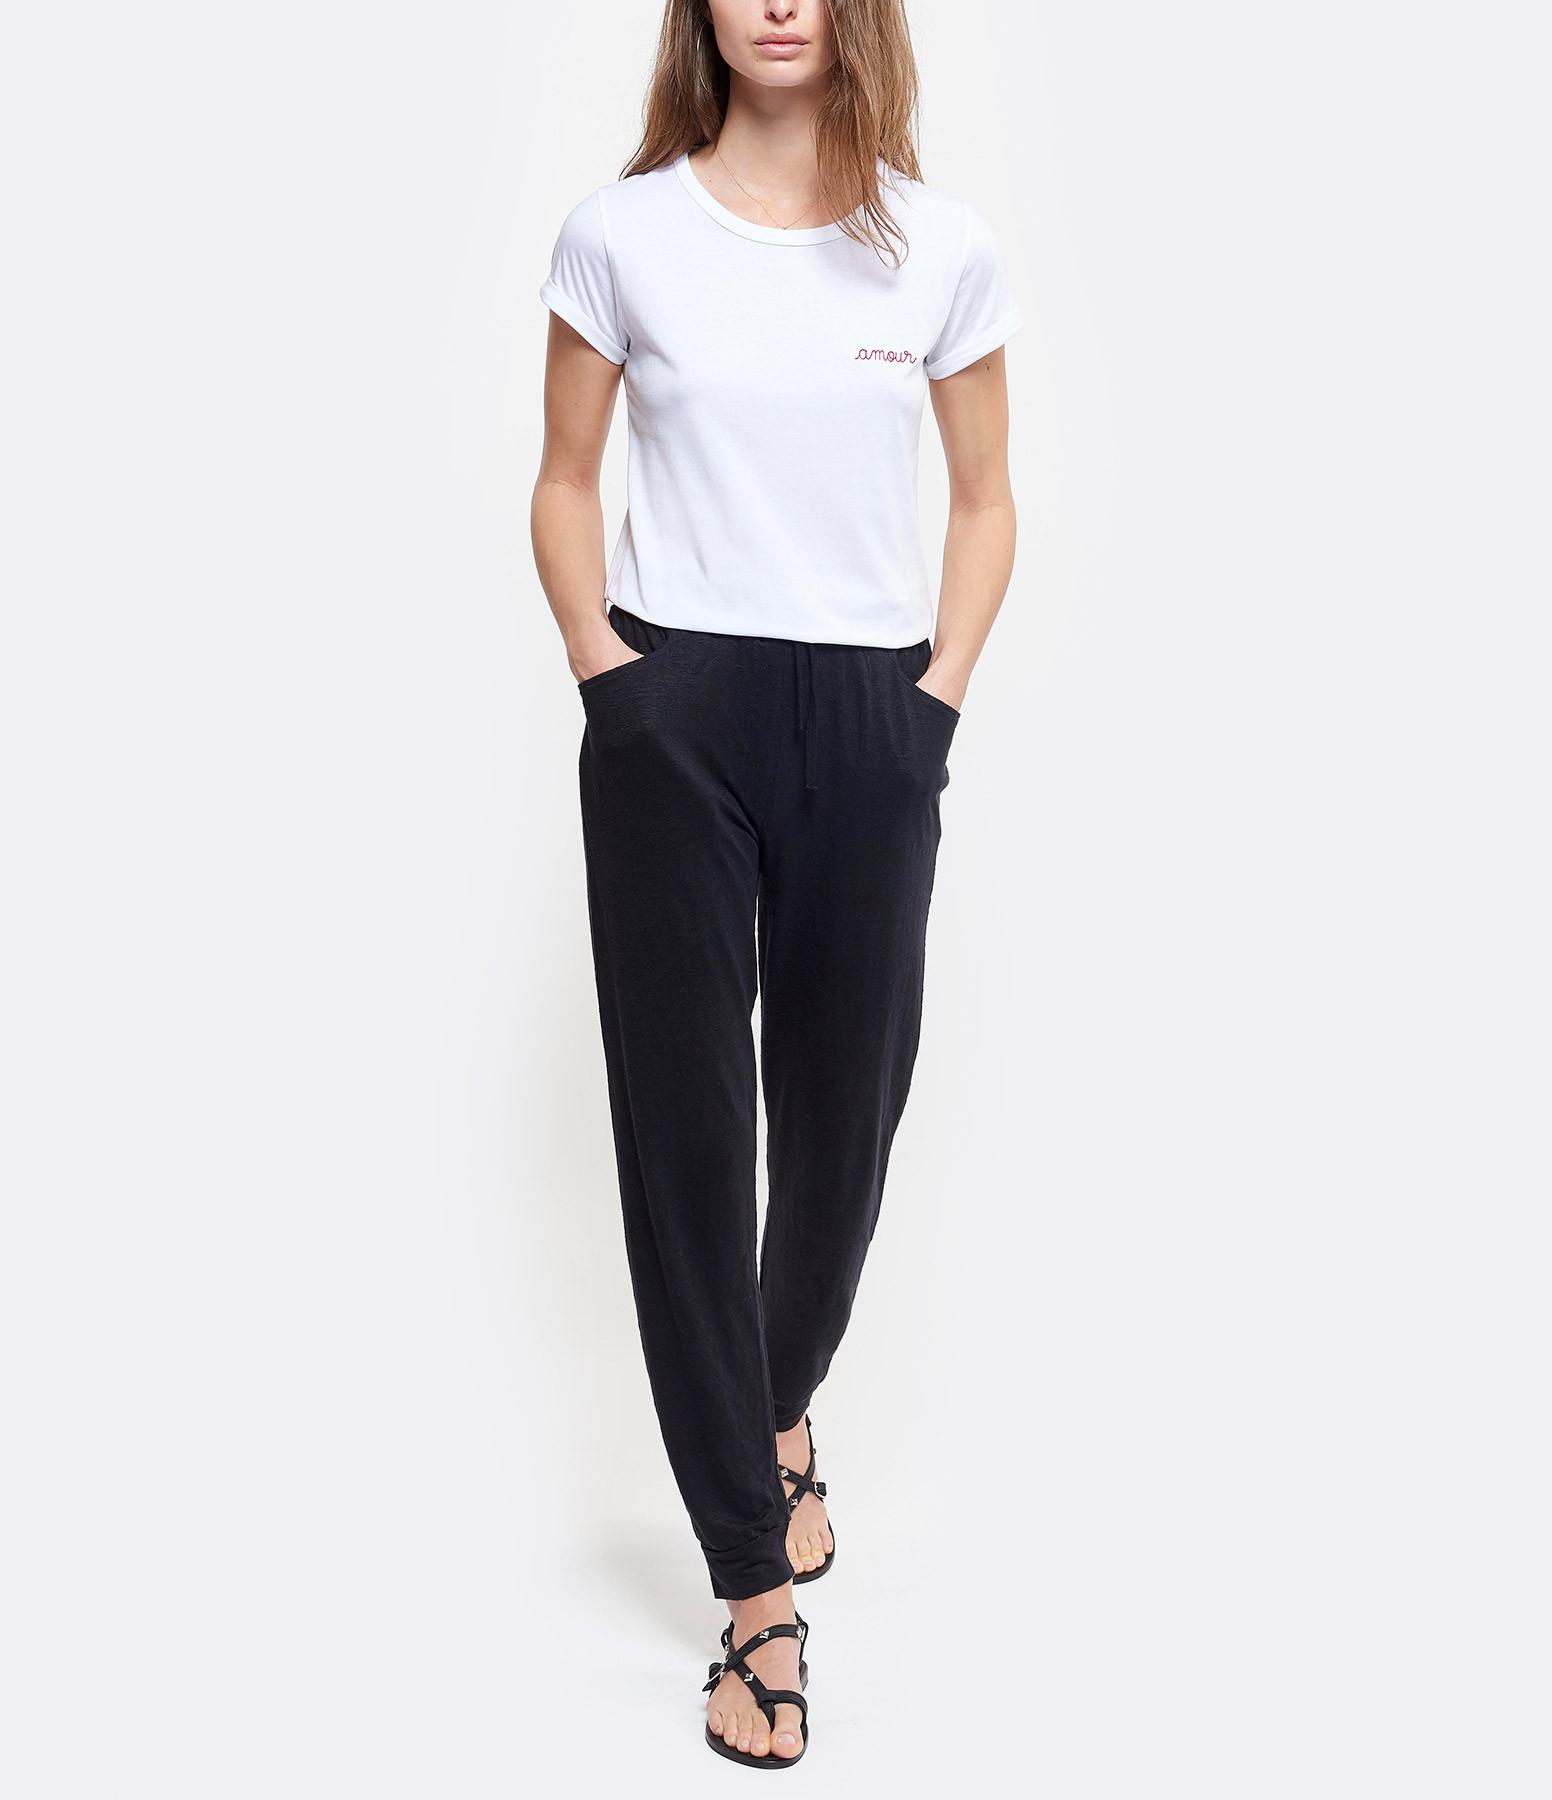 MAJESTIC FILATURES - Pantalon Jogging Lin Noir